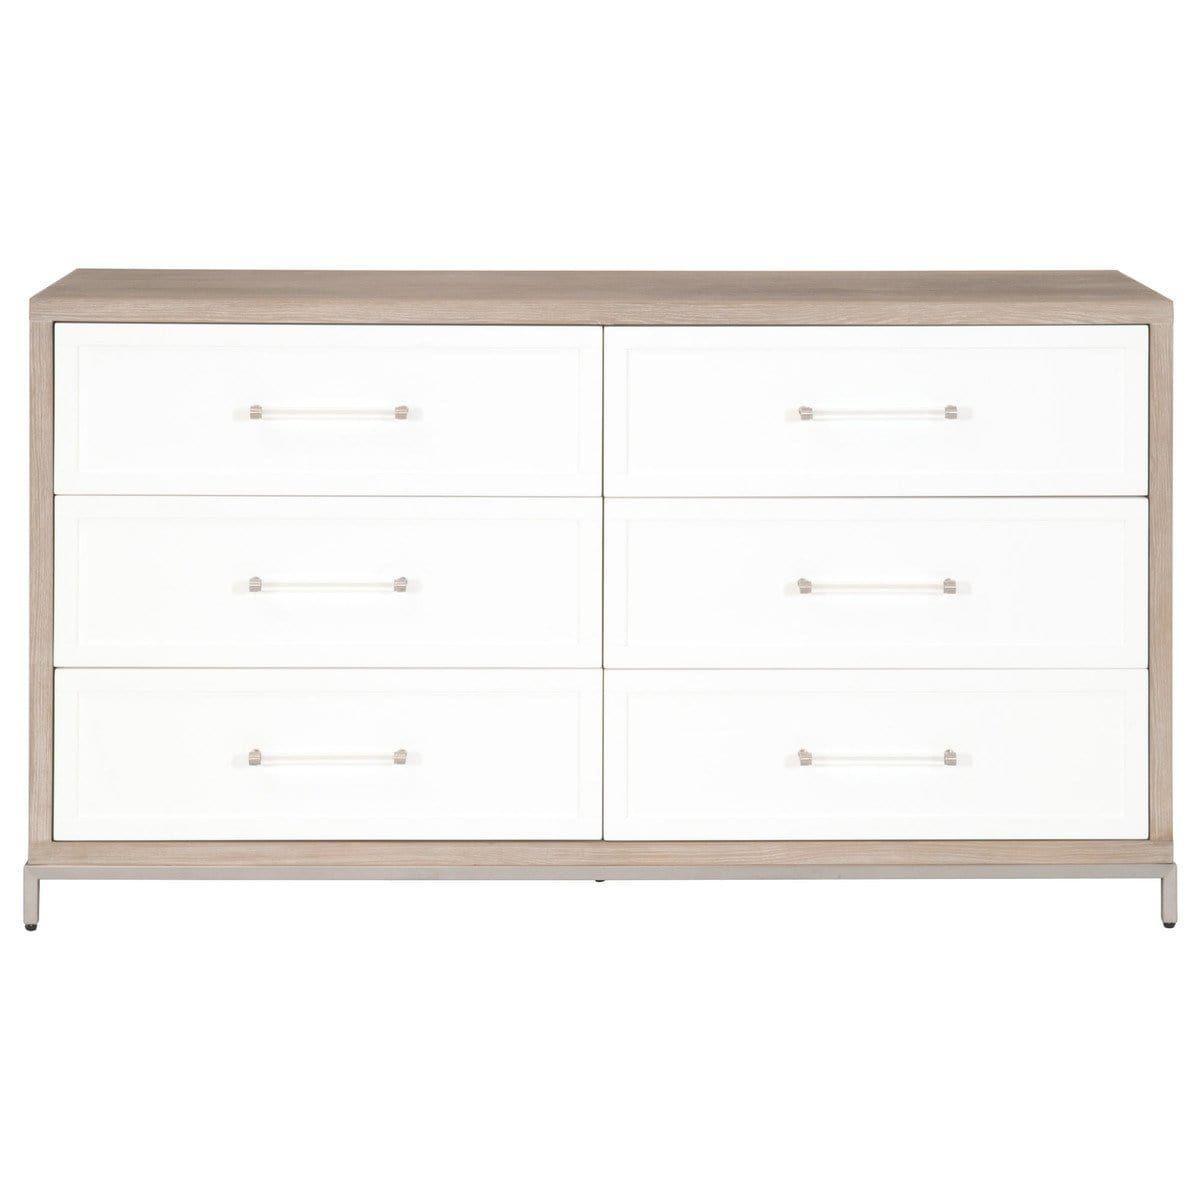 Blu Home Wrenn 6 Drawer Double Dresser Double Dresser Dresser Drawers [ 1200 x 1200 Pixel ]